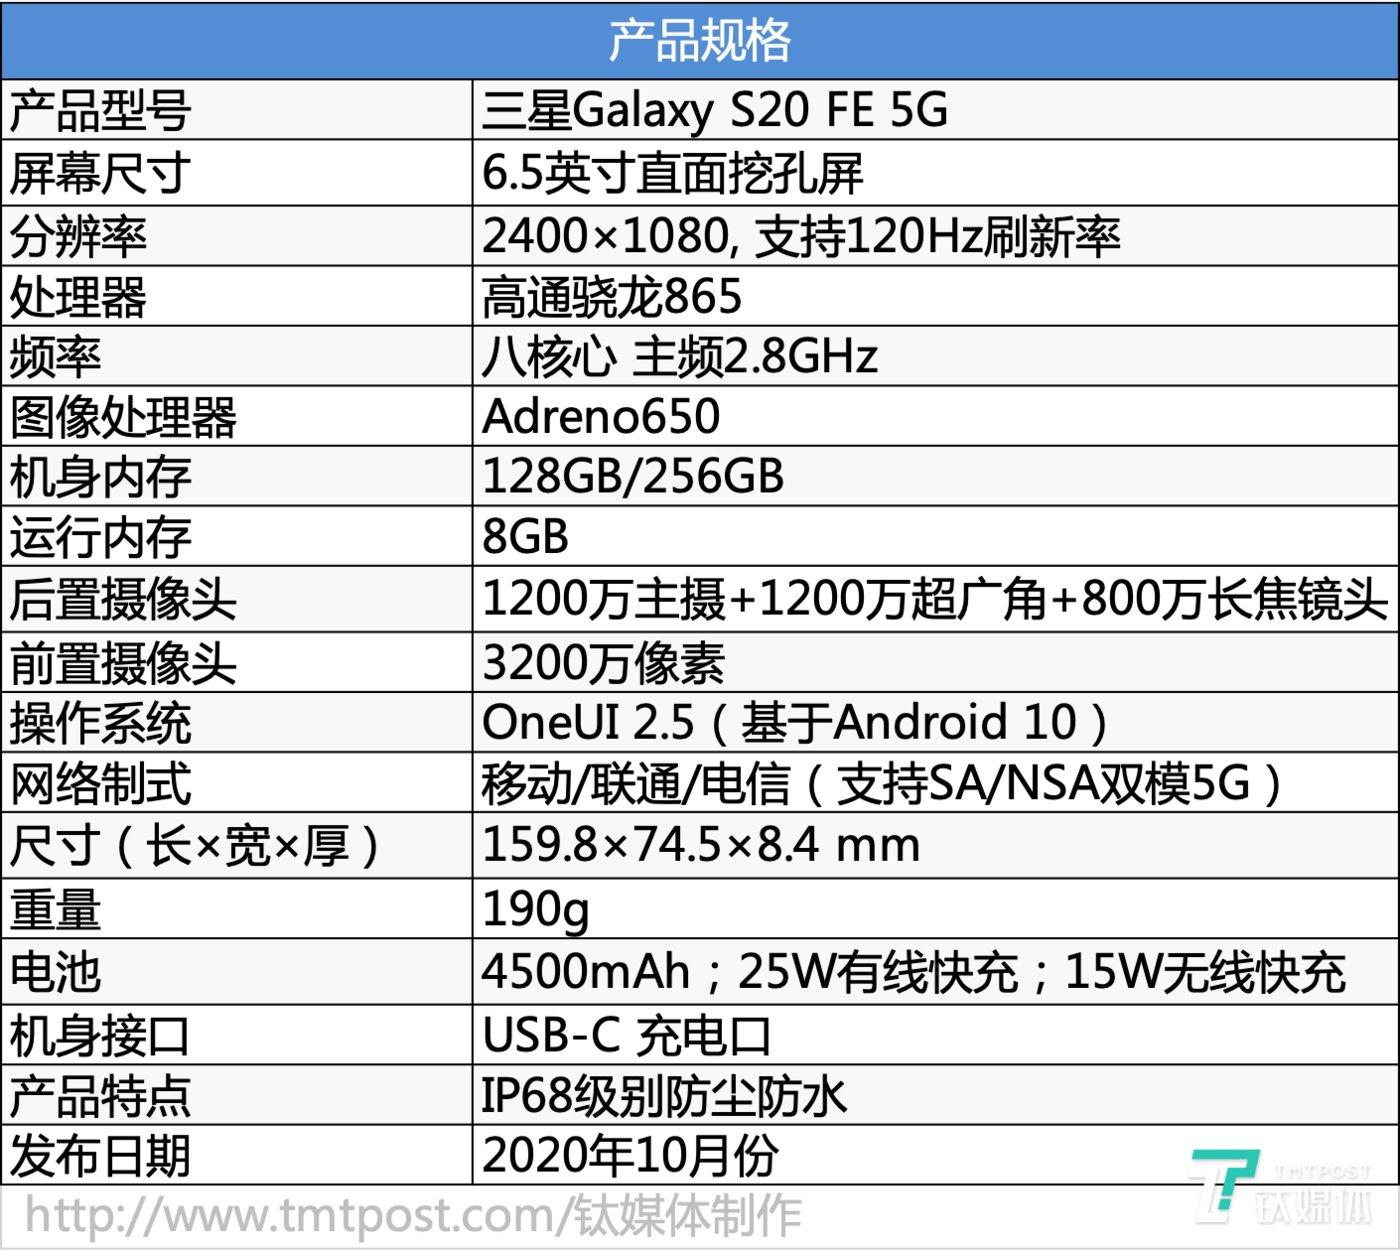 Galaxy S20 FE 5G硬件参数一览